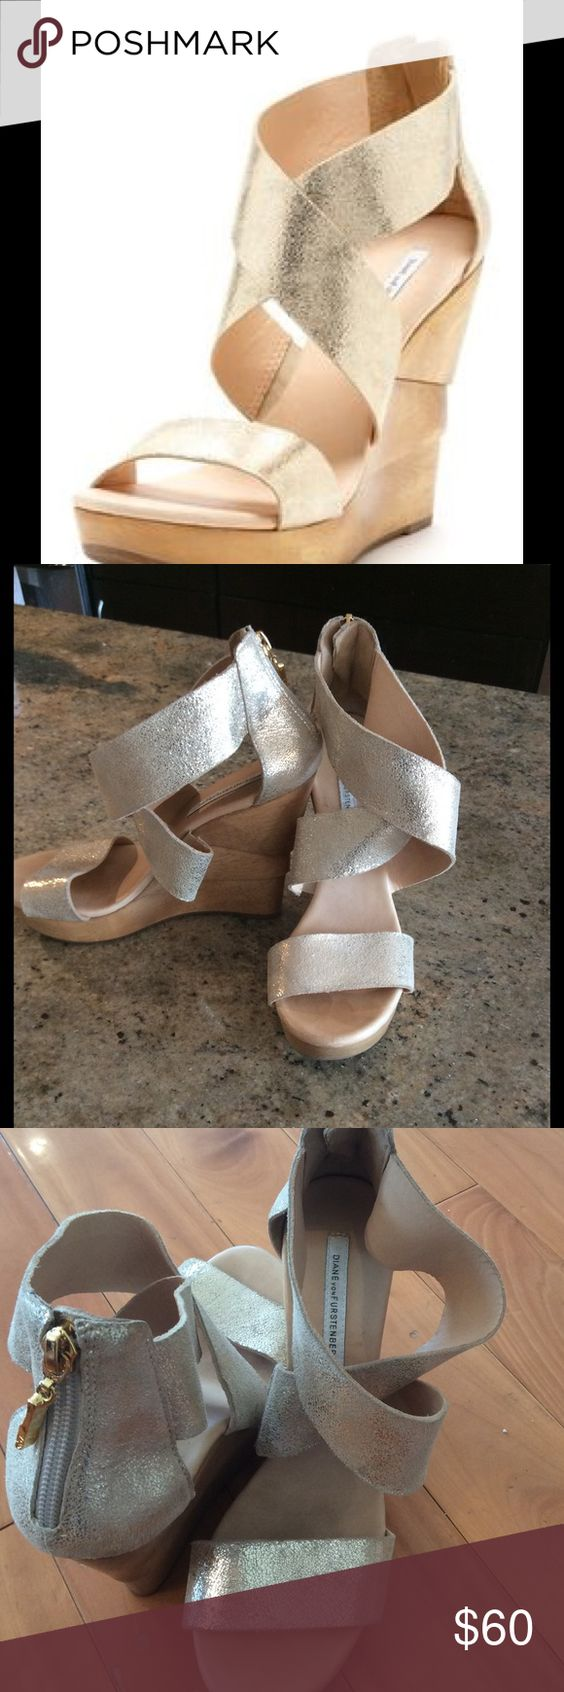 Gold Diane Von Frustenberg Opal Wedges Super cute gold wedges! EUC. Gold straps and wood wedge heel. Size 7.5 Diane von Furstenberg Shoes Wedges